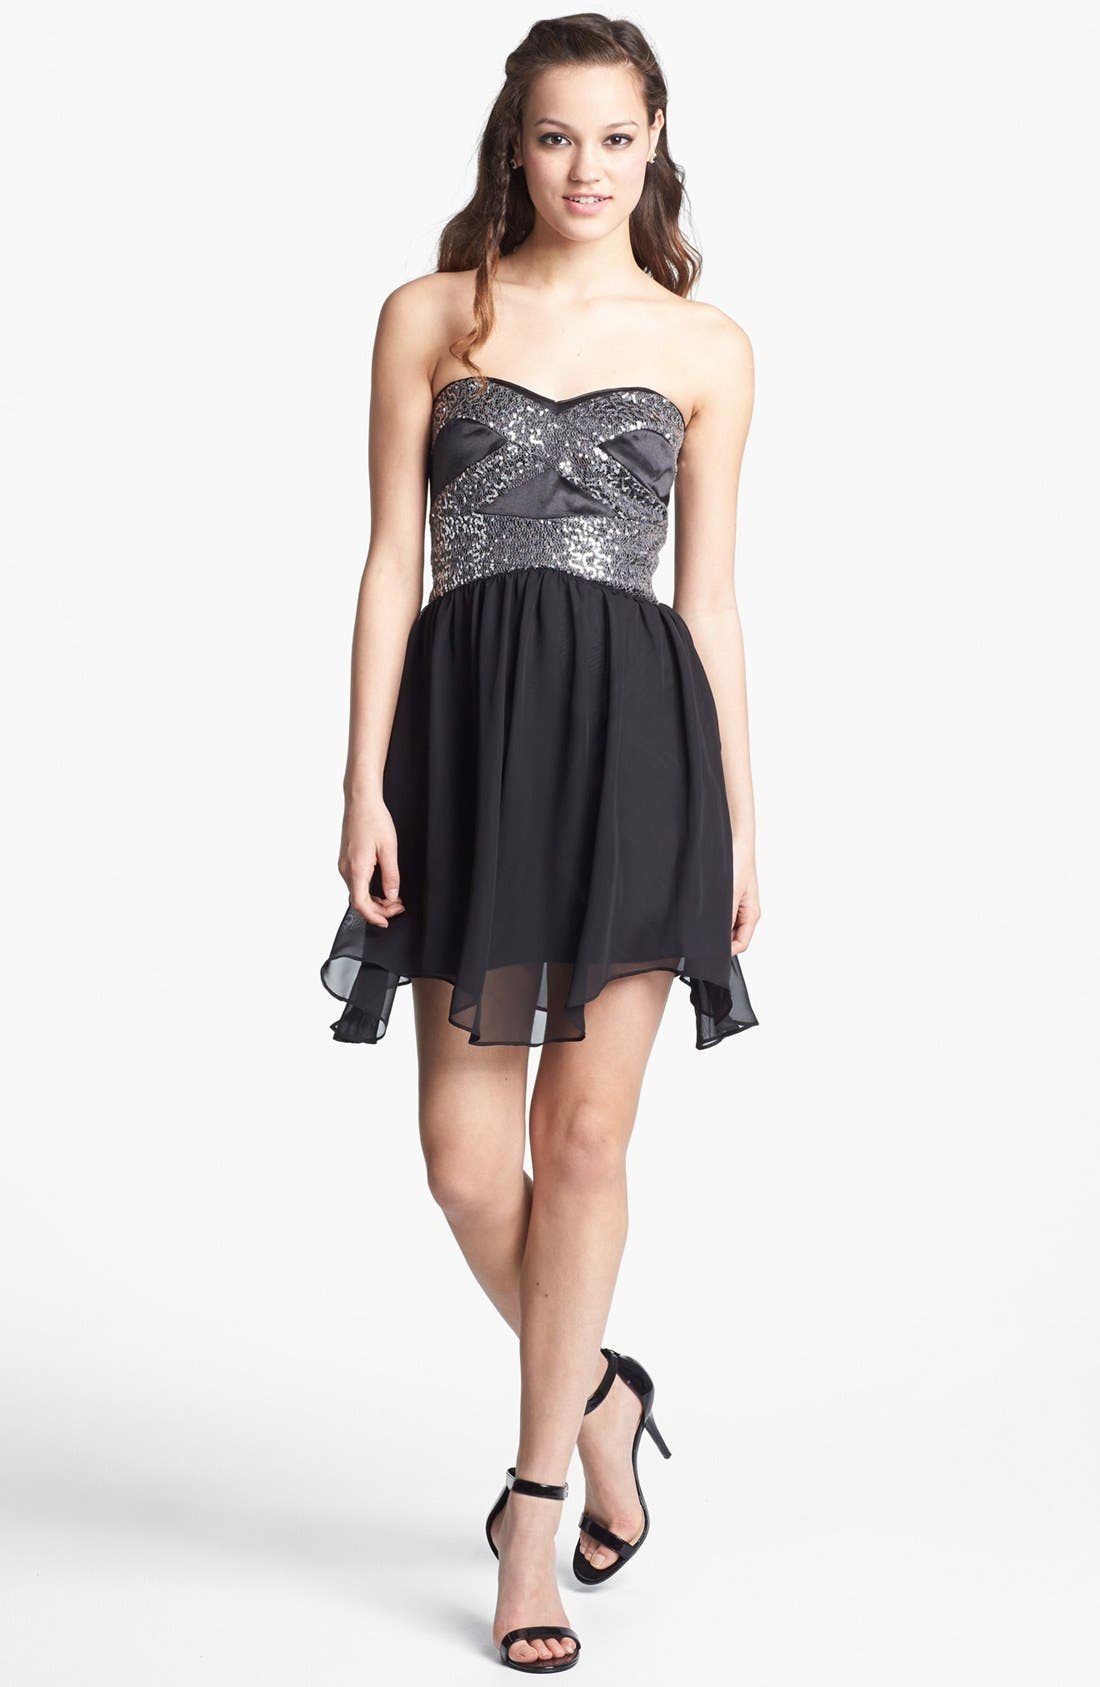 Alternate Image 1 Selected - Hailey Logan Embellished Fit & Flare Dress (Juniors) (Online Only)